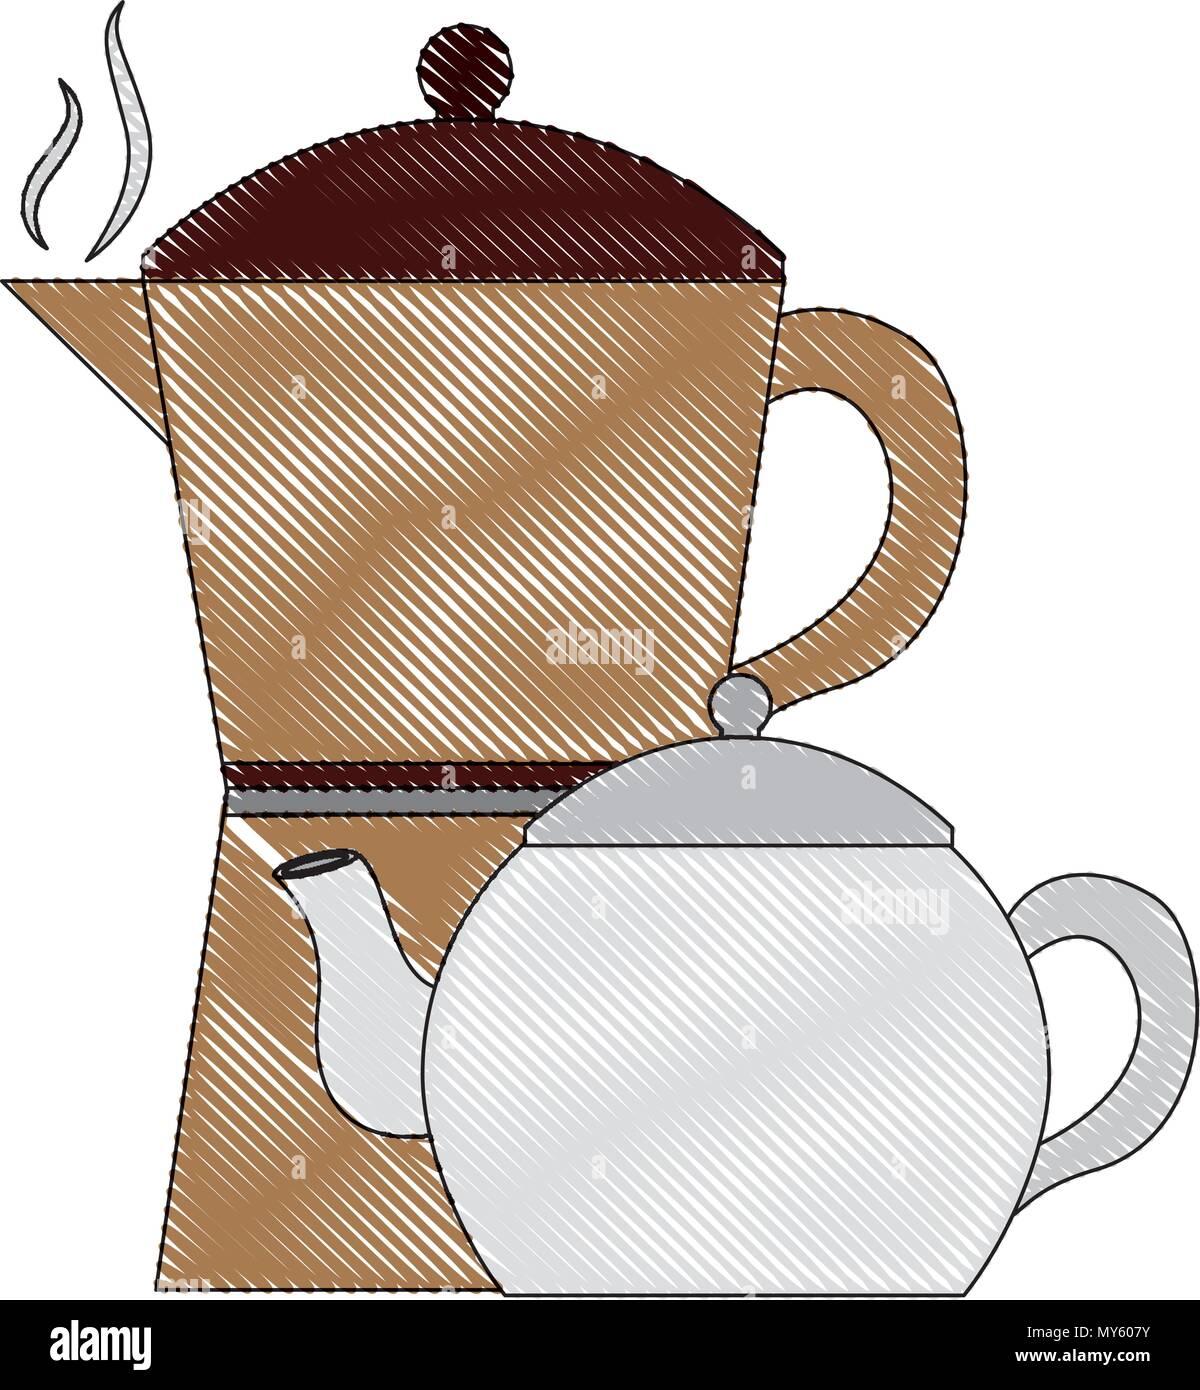 Coffee Maker And Tea Pot Ceramic Kitchen Supplies Vector